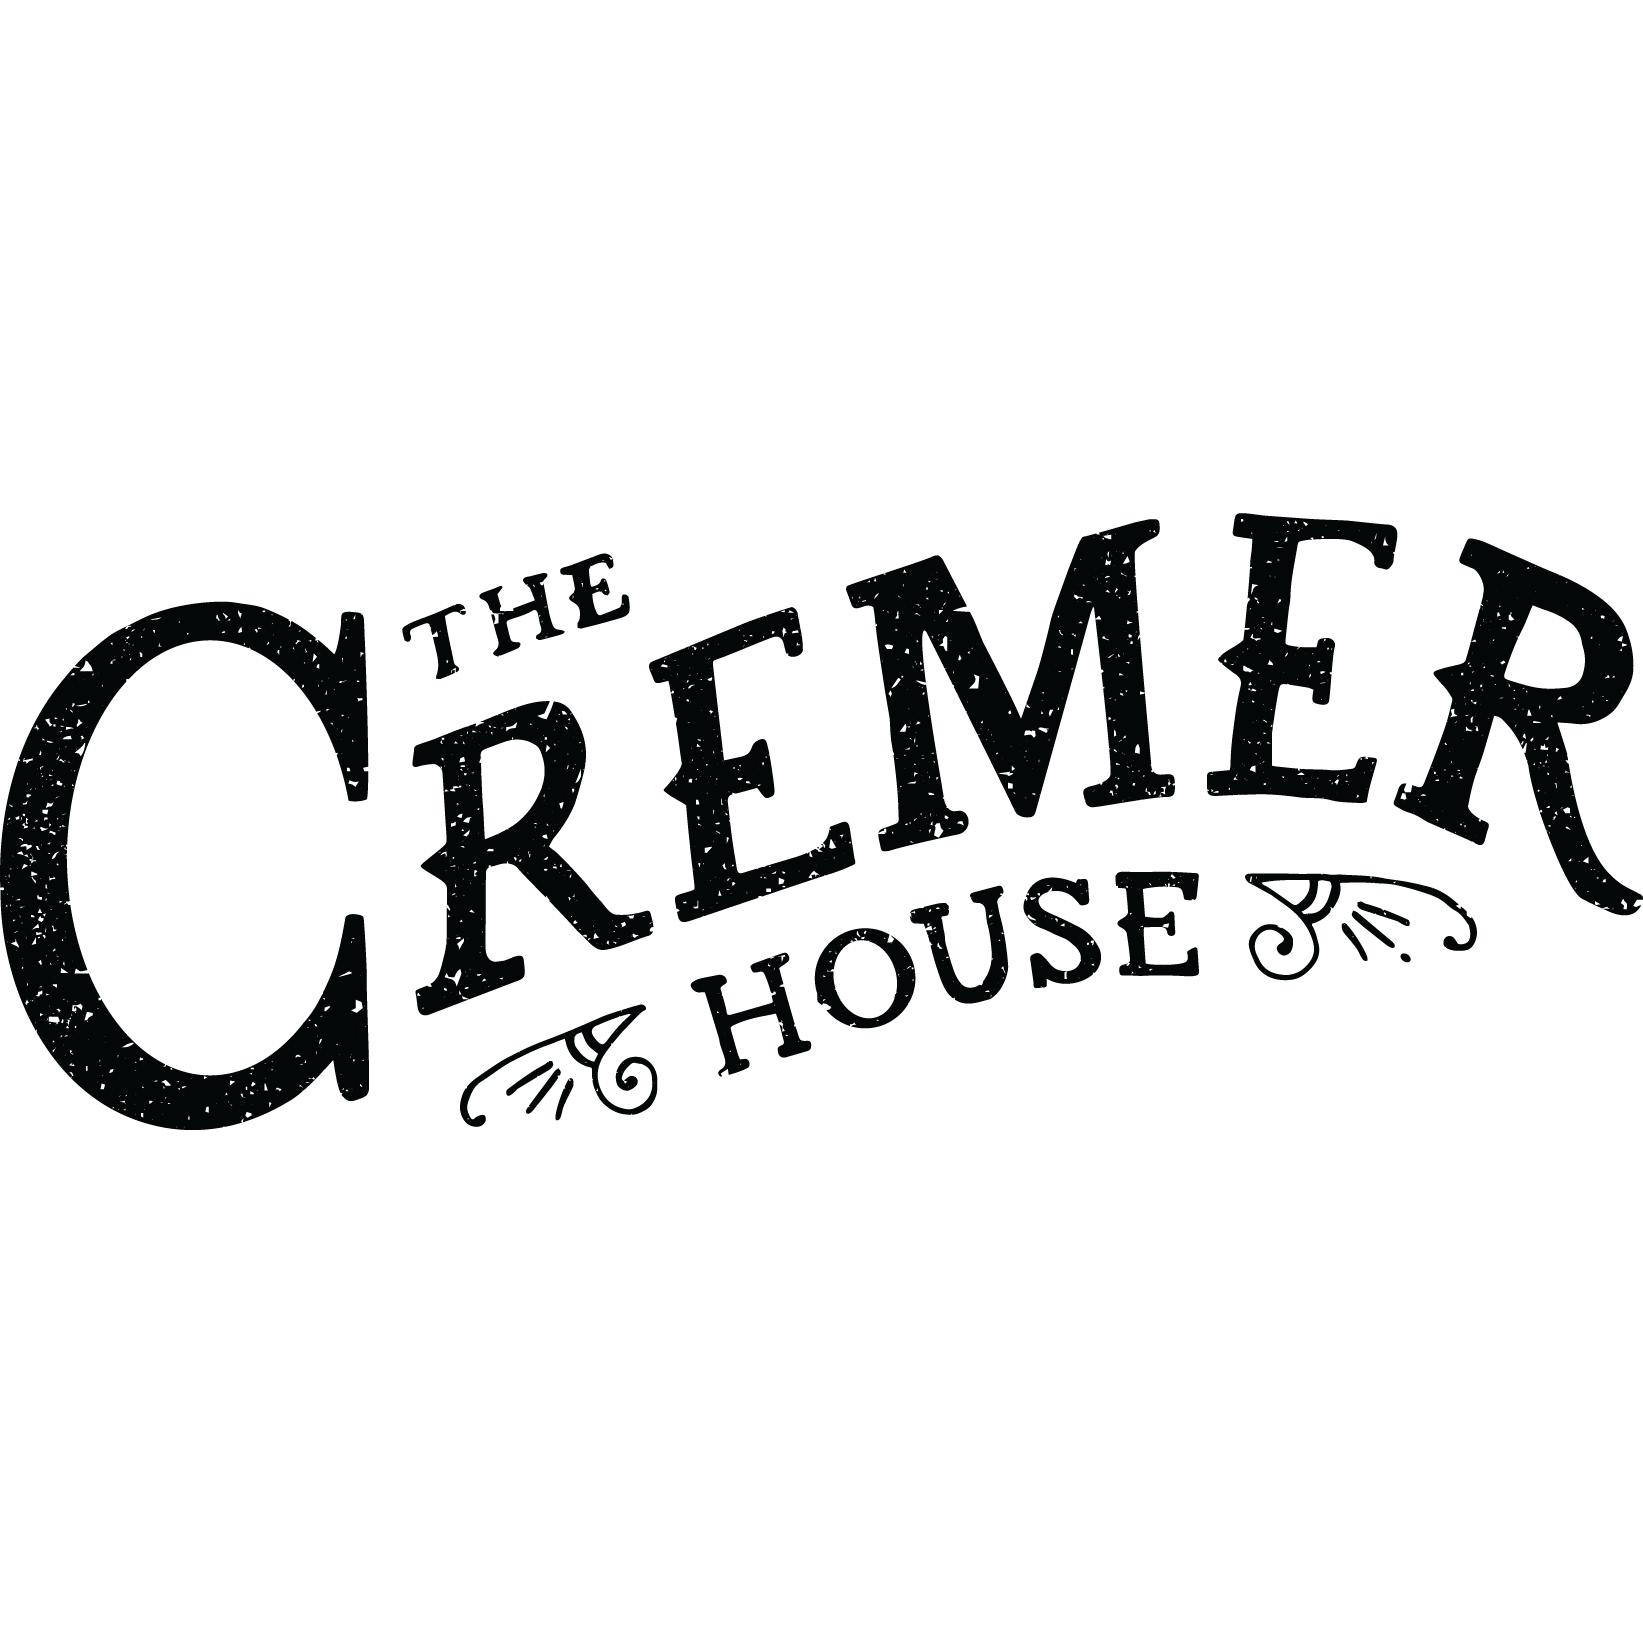 Cremer_House_Logo_no_text.png